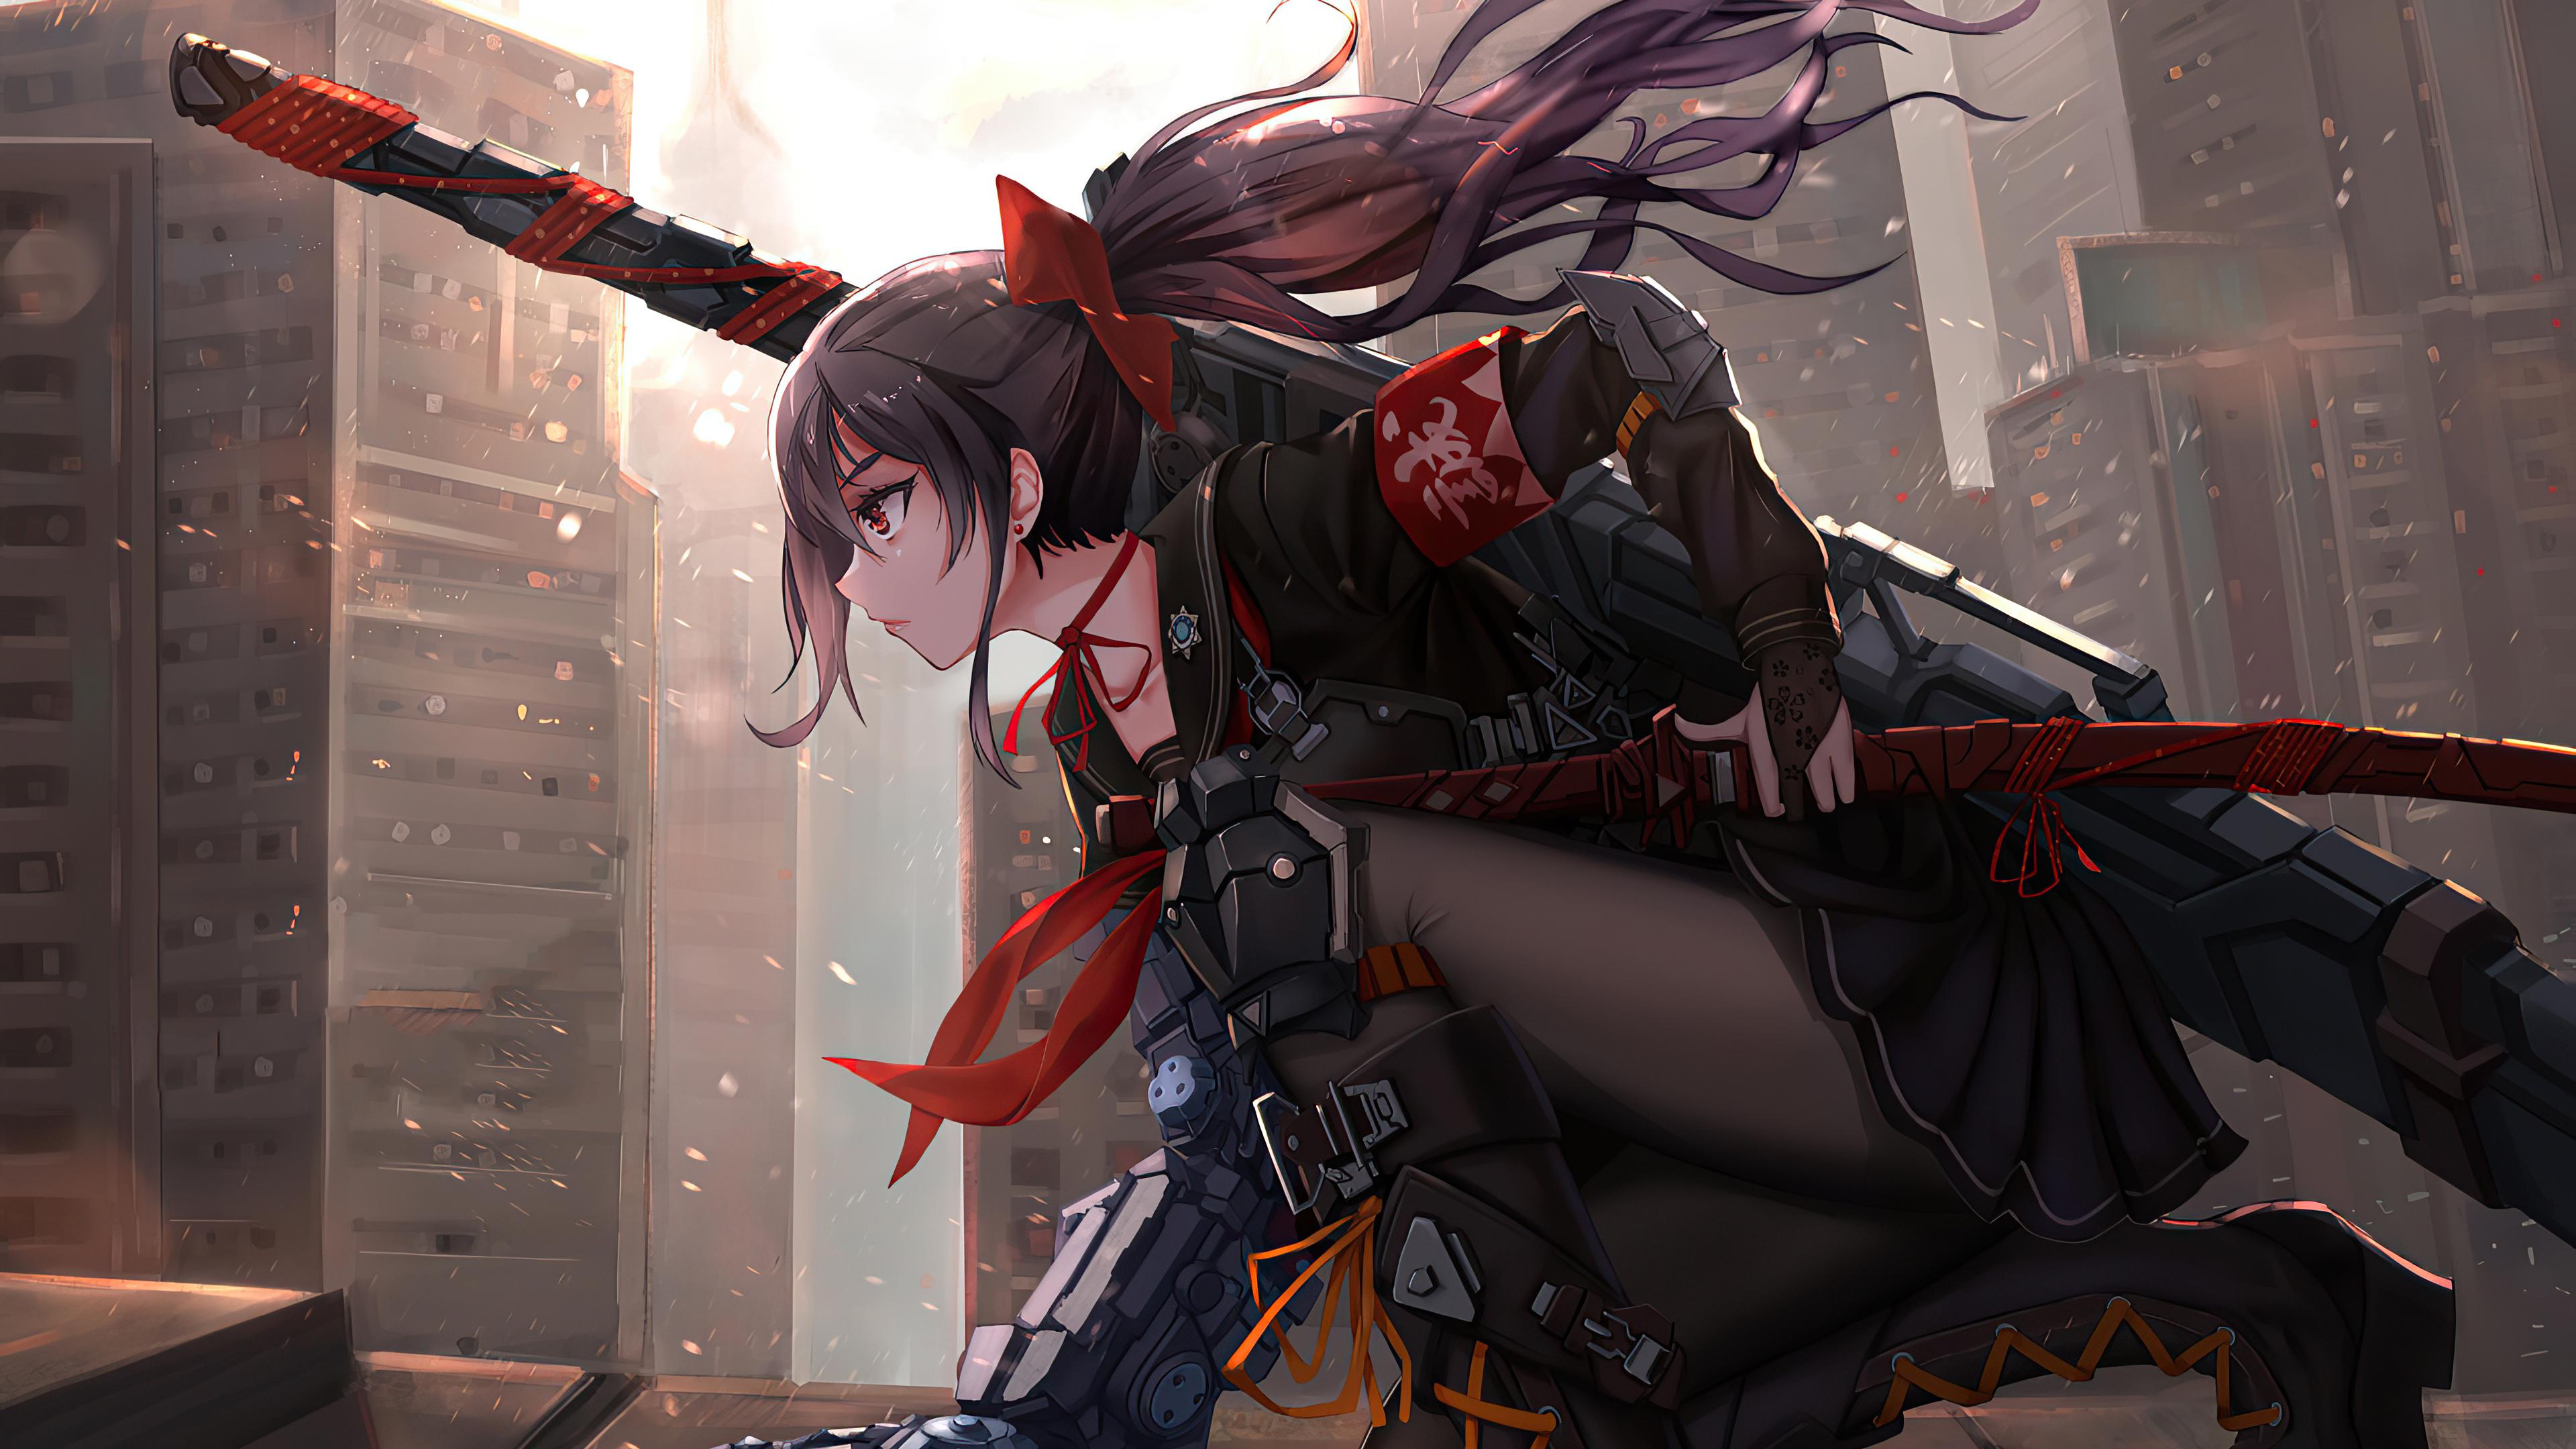 1360x768 Anime Cyber Arm Sword Girl 4k Laptop HD HD 4k ...